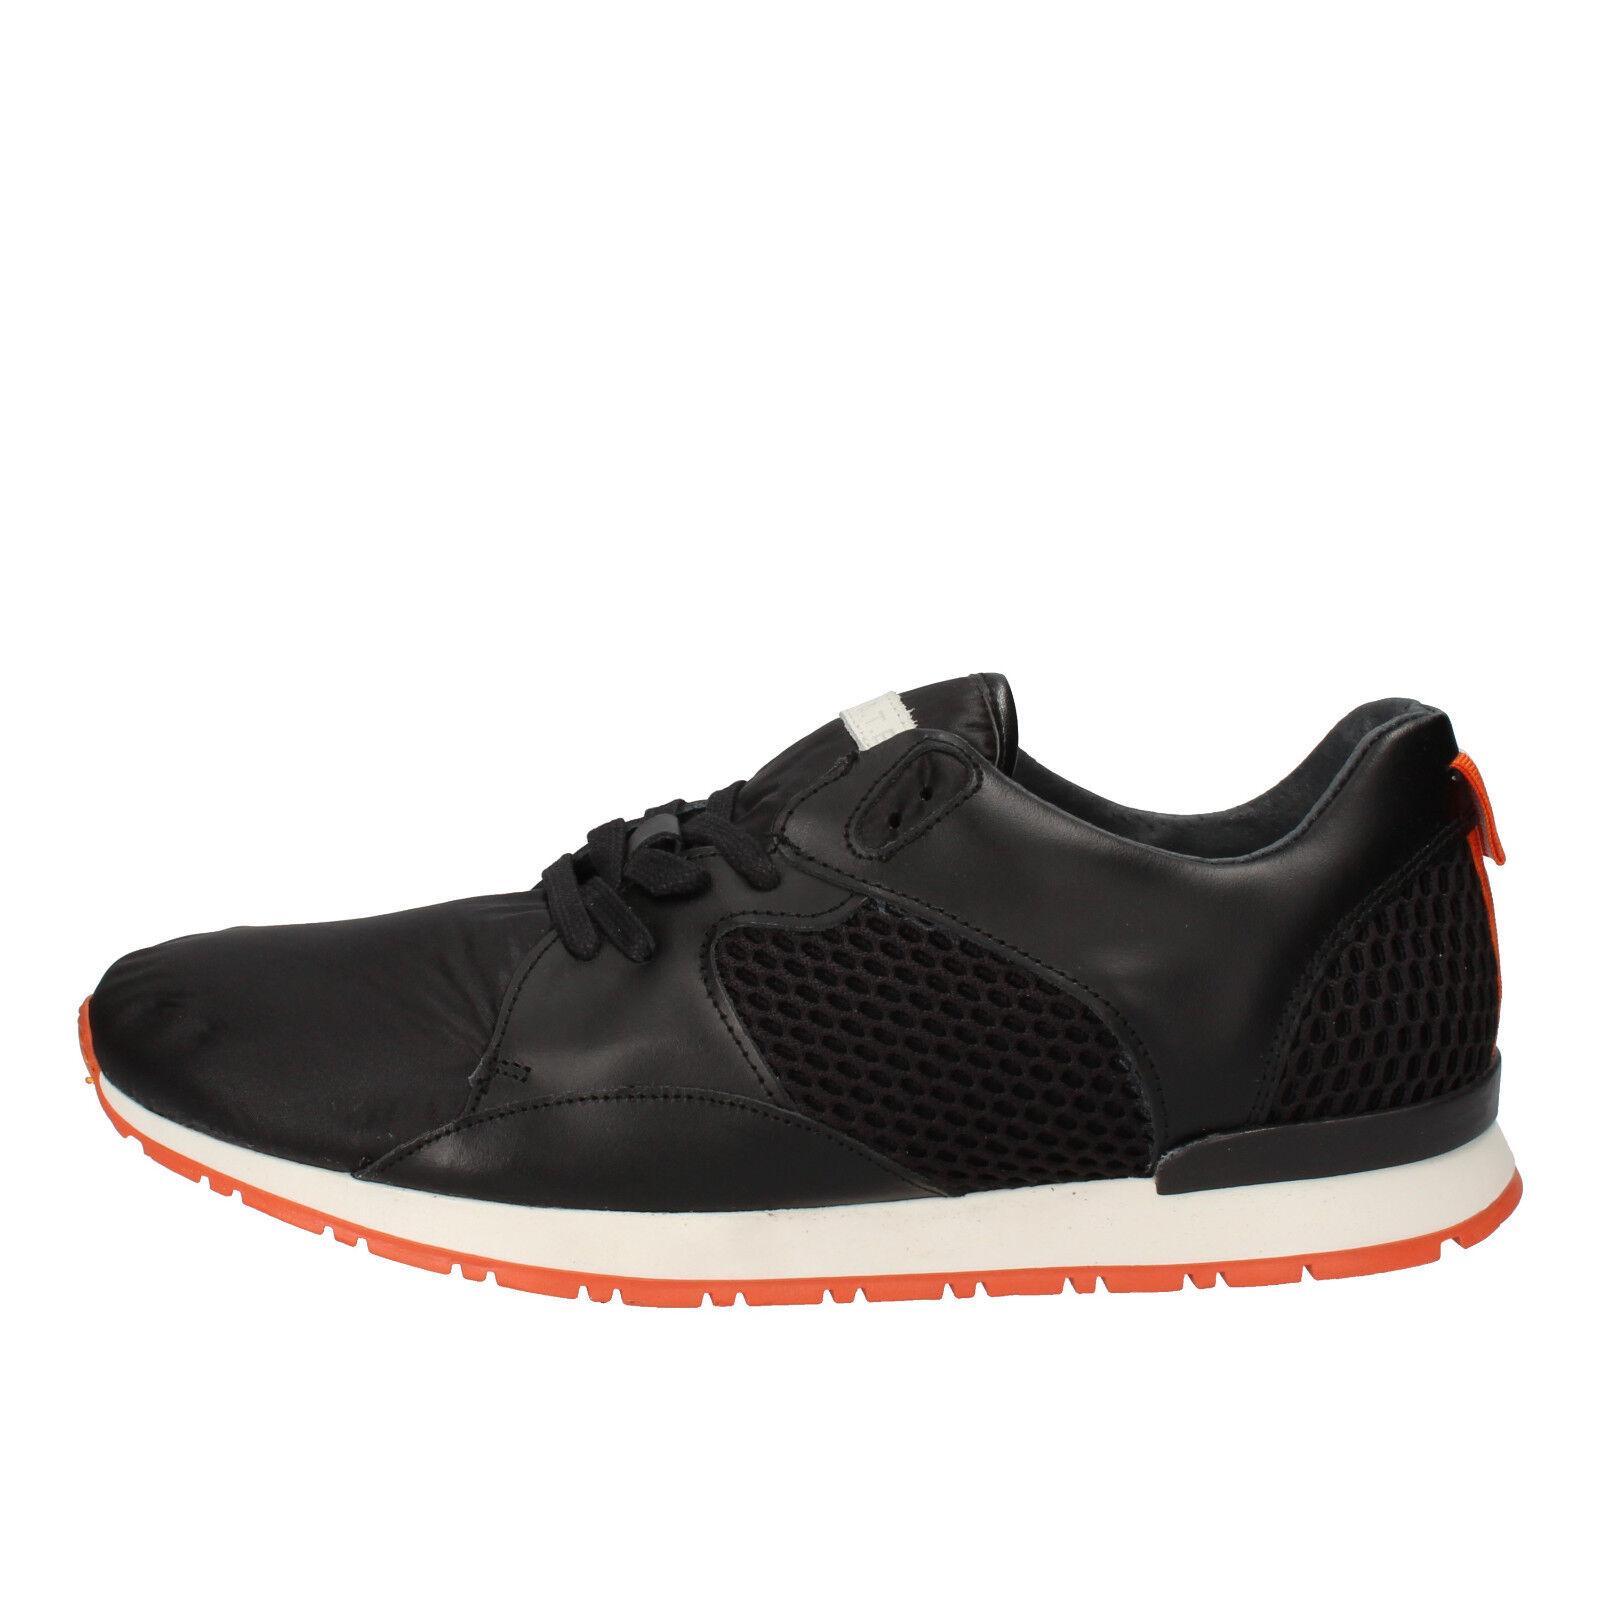 Women 8 men's 9.5 shoes D.A.T.E. date EU 41 sneakers black leather AE532-B